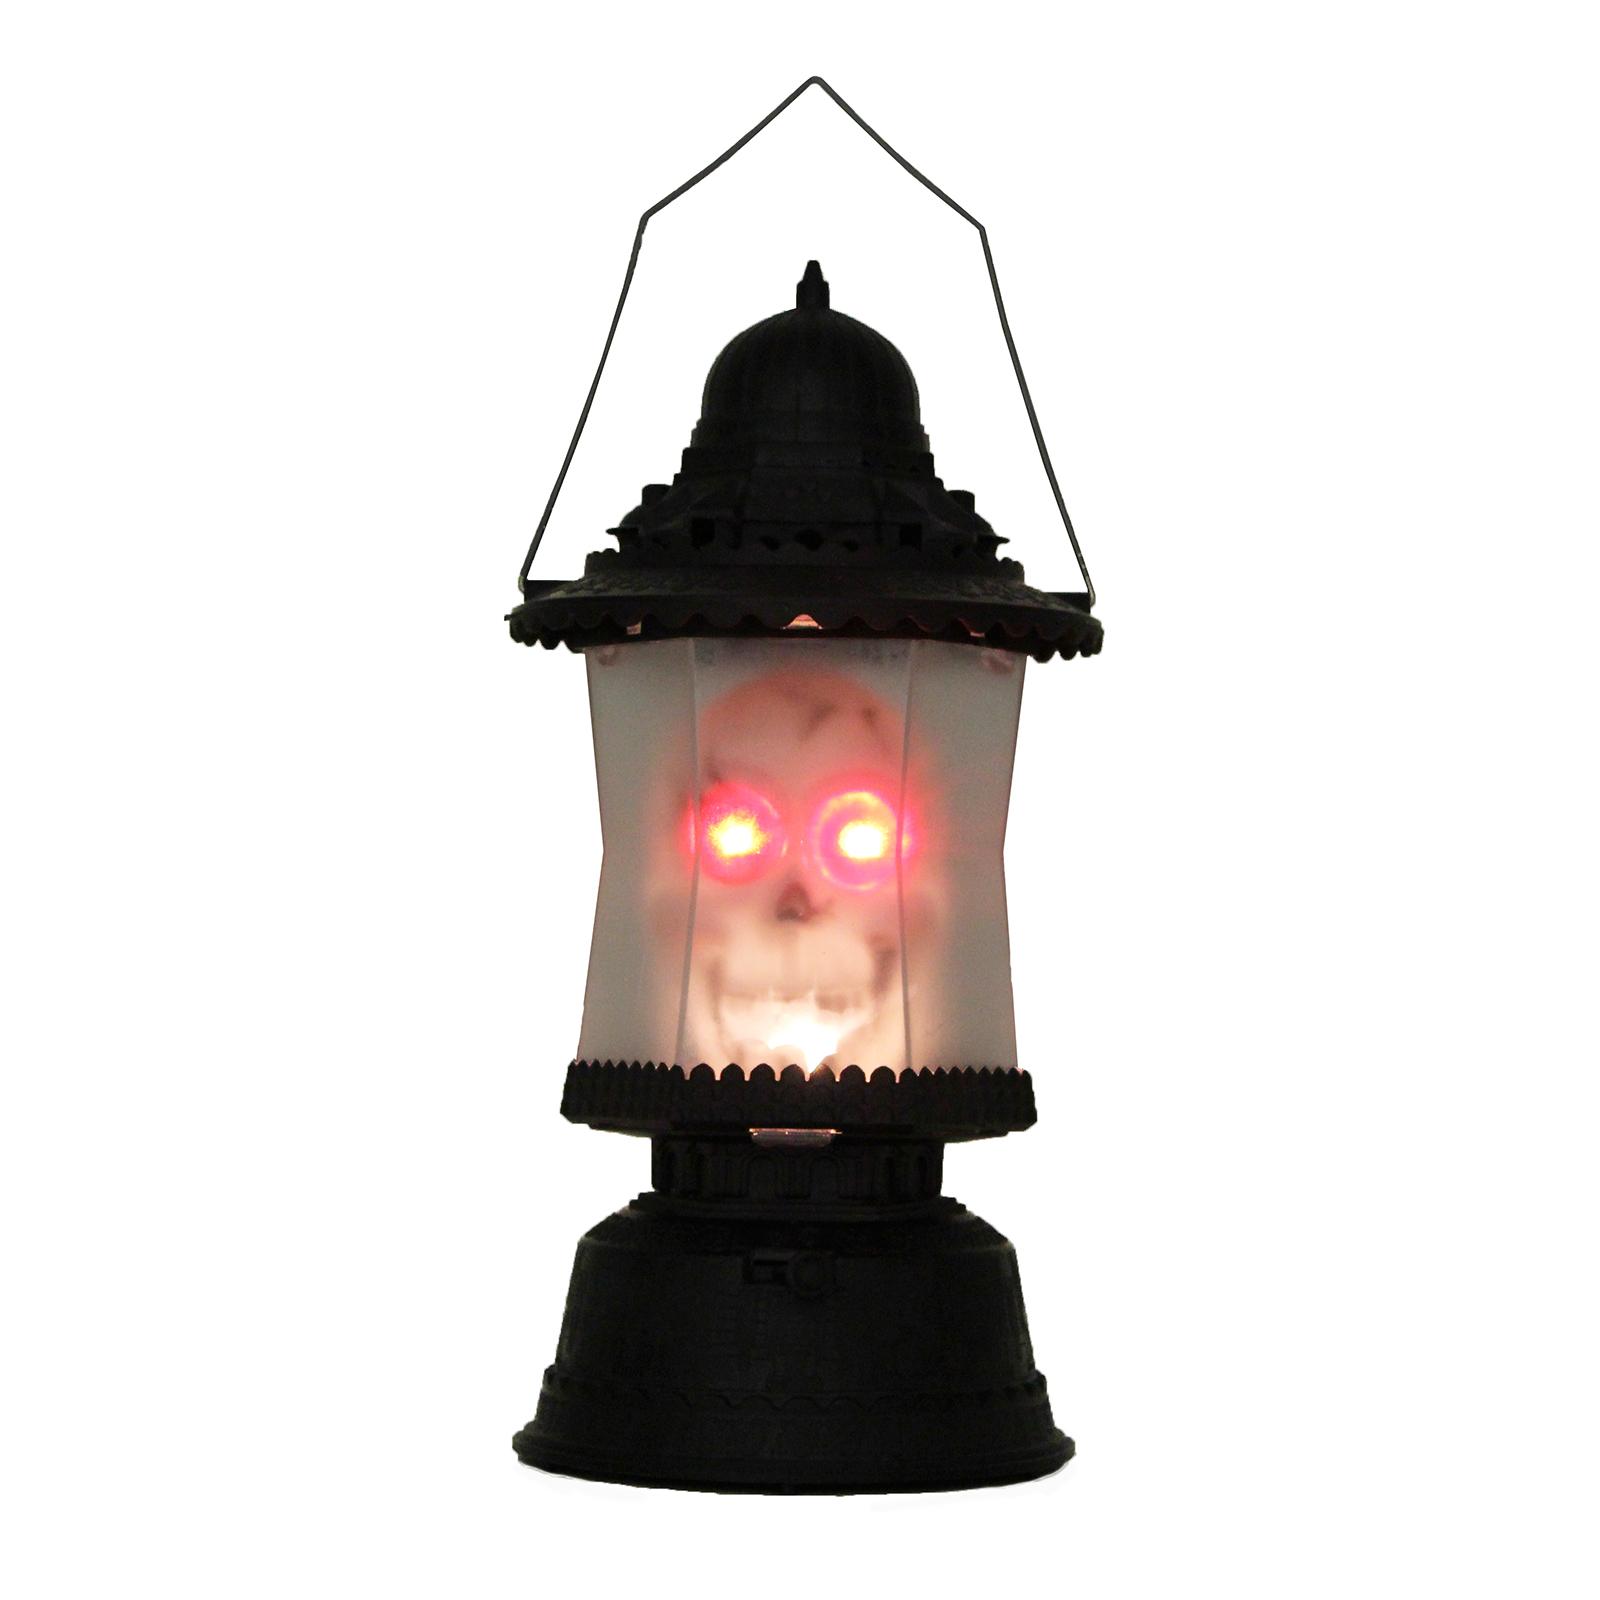 LED Skull Lantern Music Sounds Light up Scary Skeleton Halloween Decoration Lamp